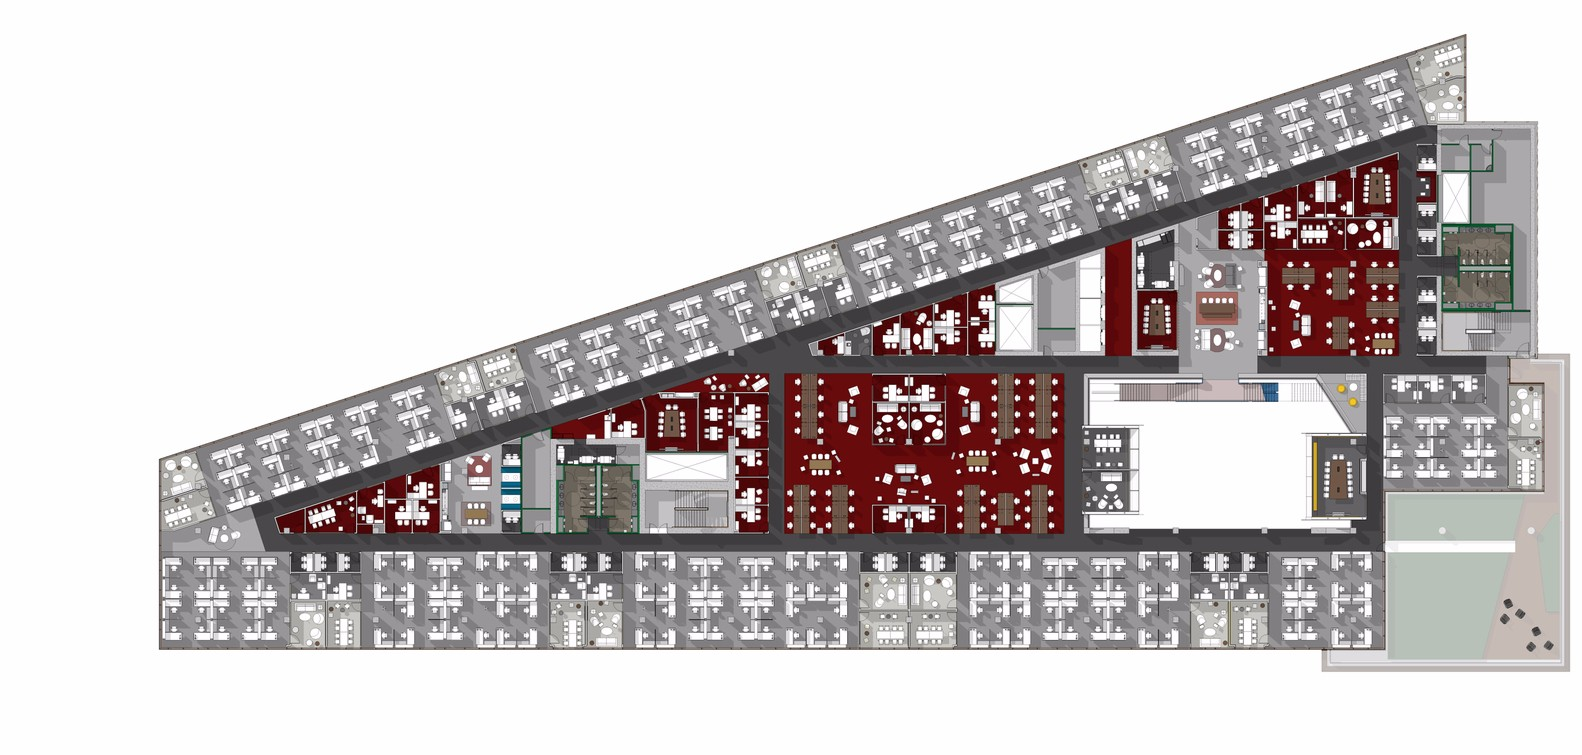 Intuit海洋路大廈——探索可持續的公共參與型發展模式插图20